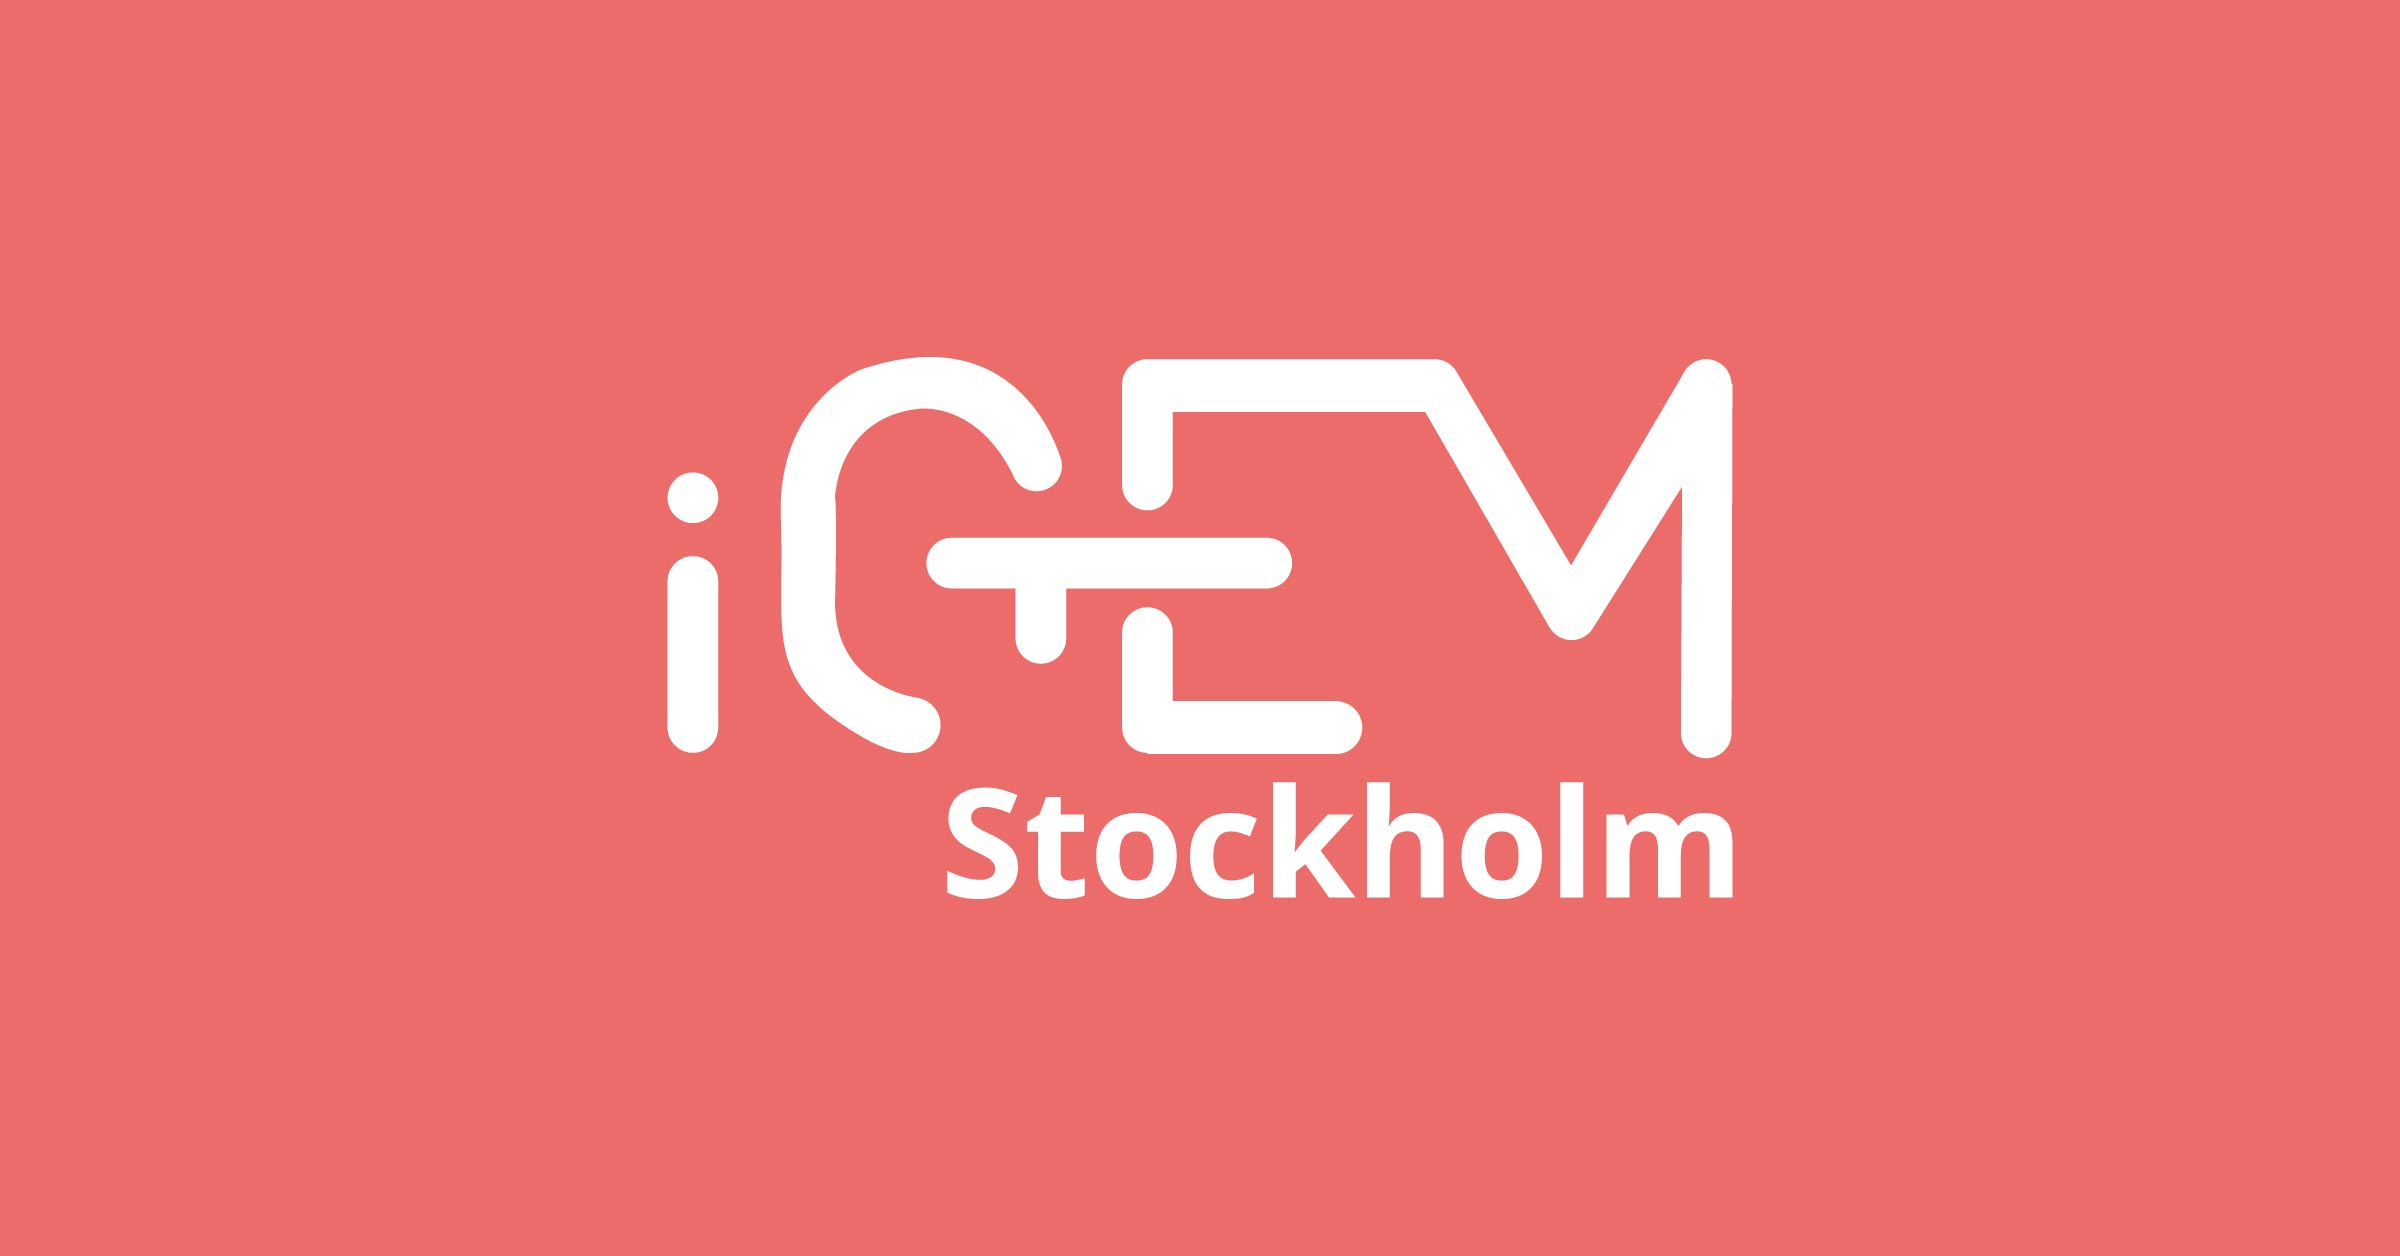 igem_stockholm_logo_red_small